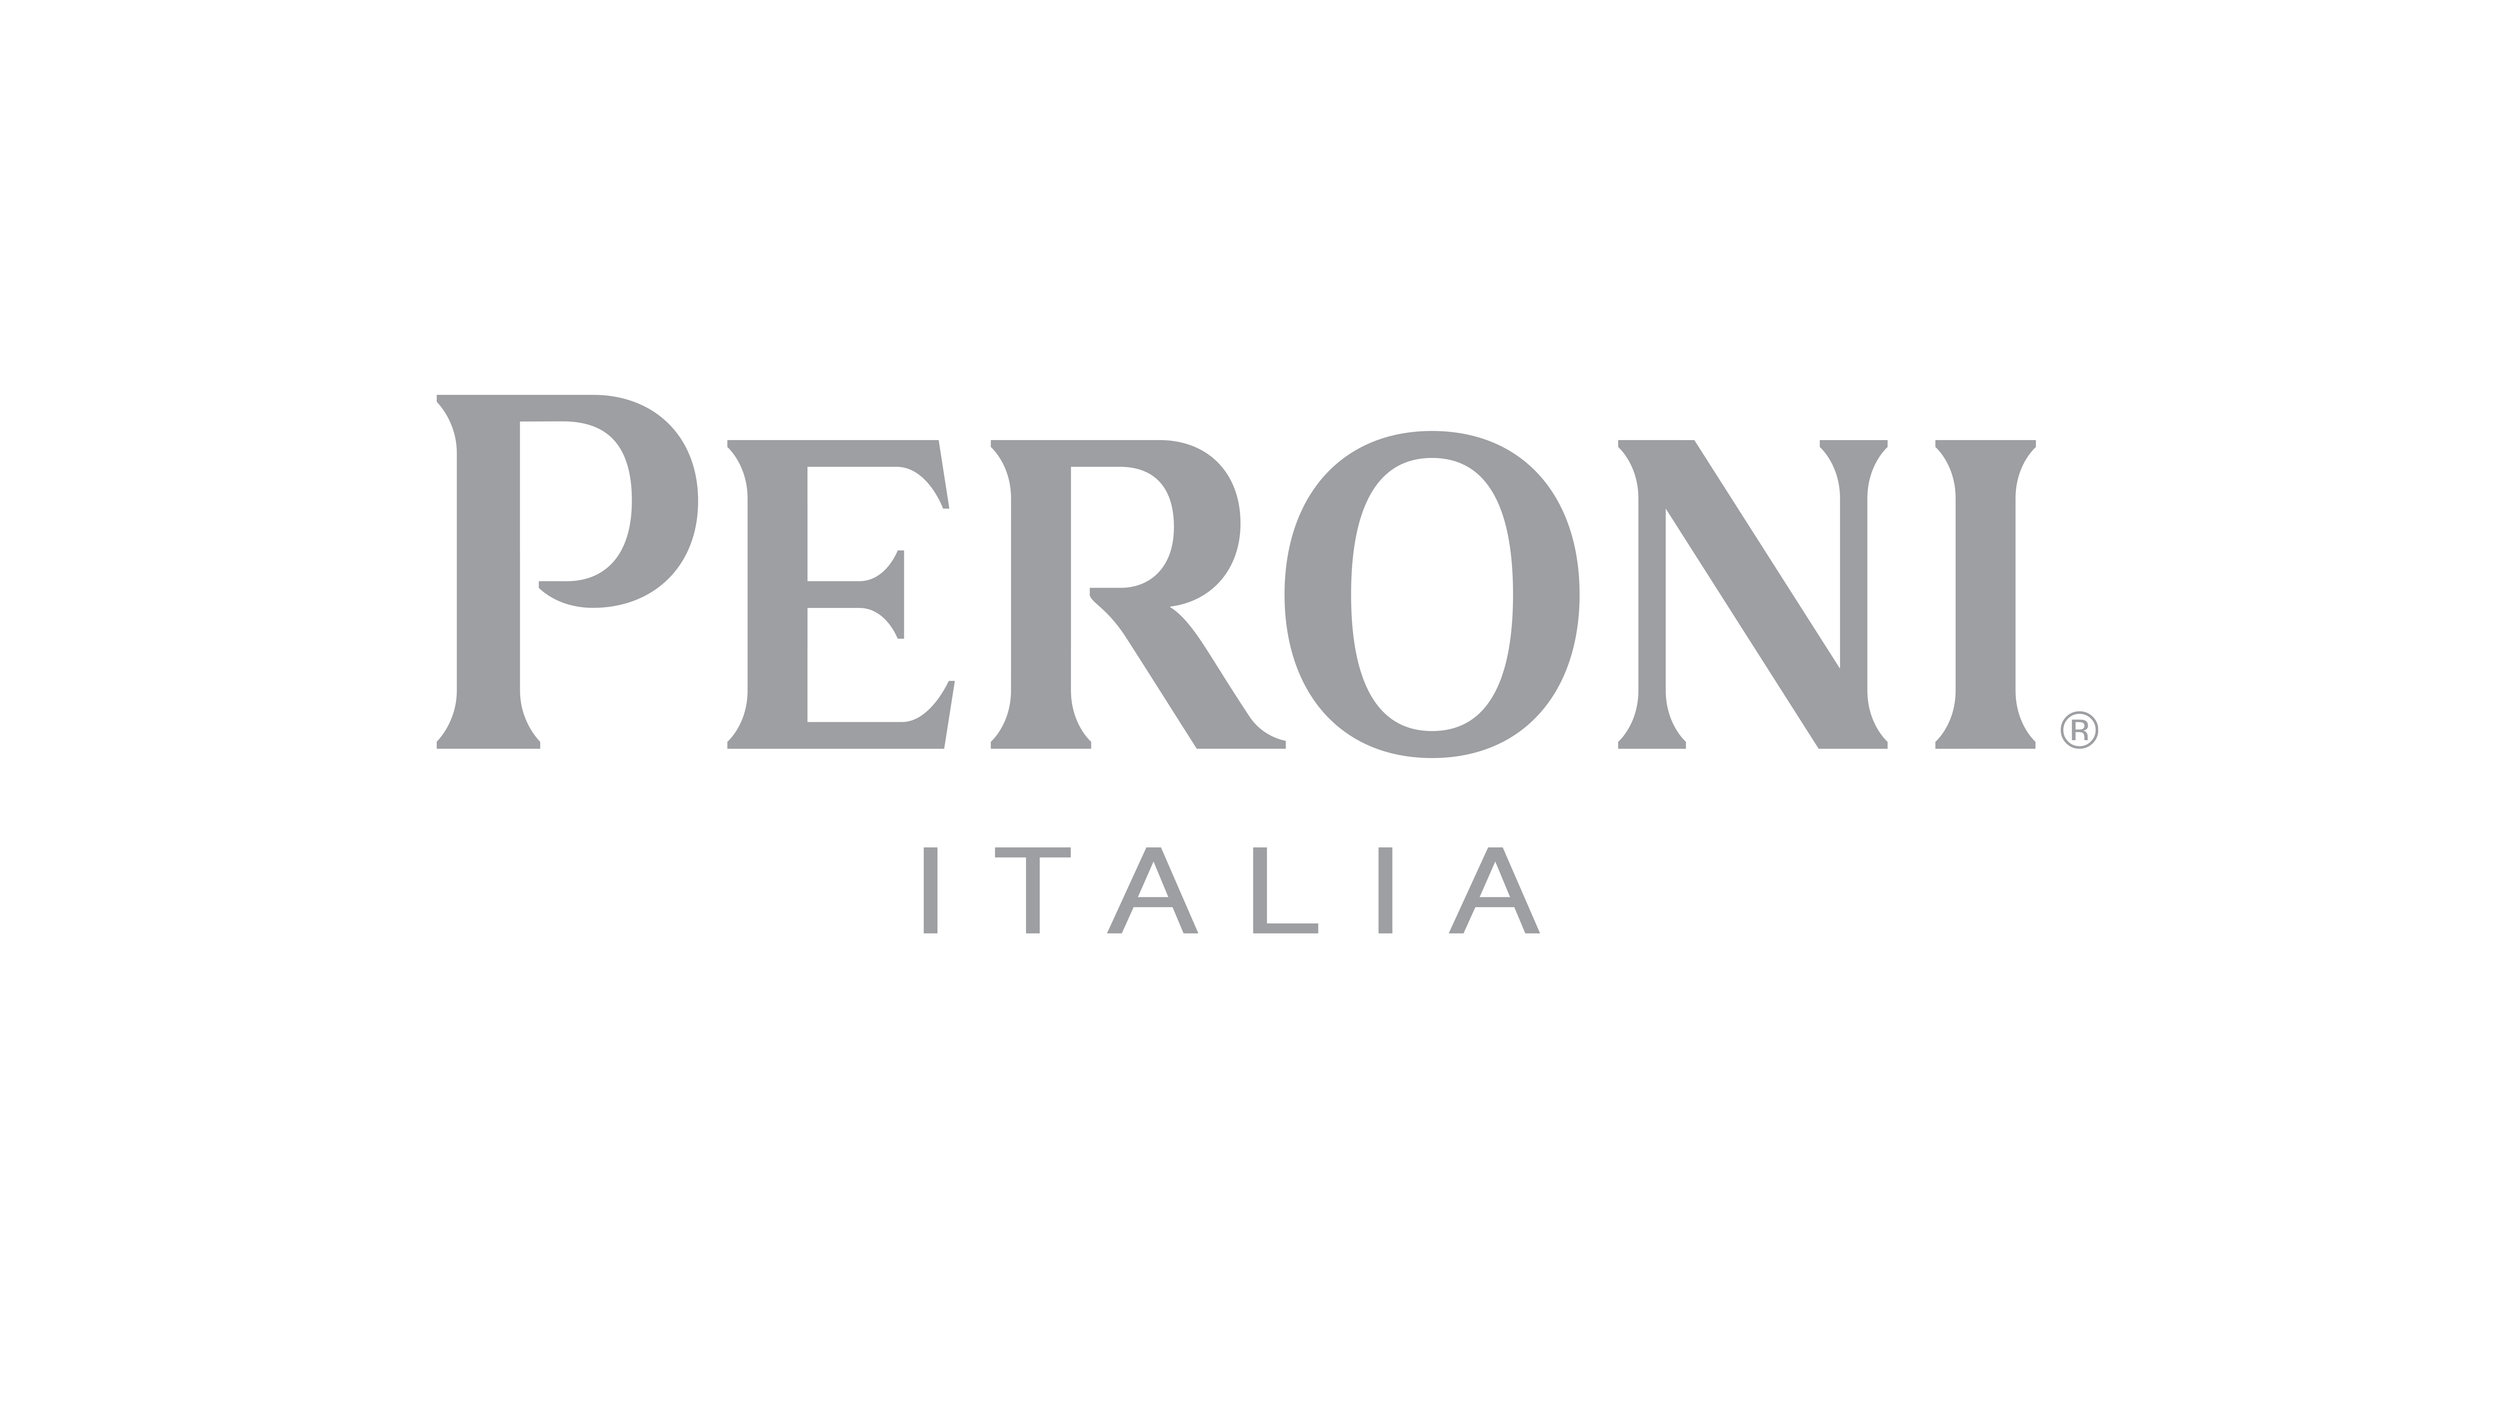 Peroni logo.jpg